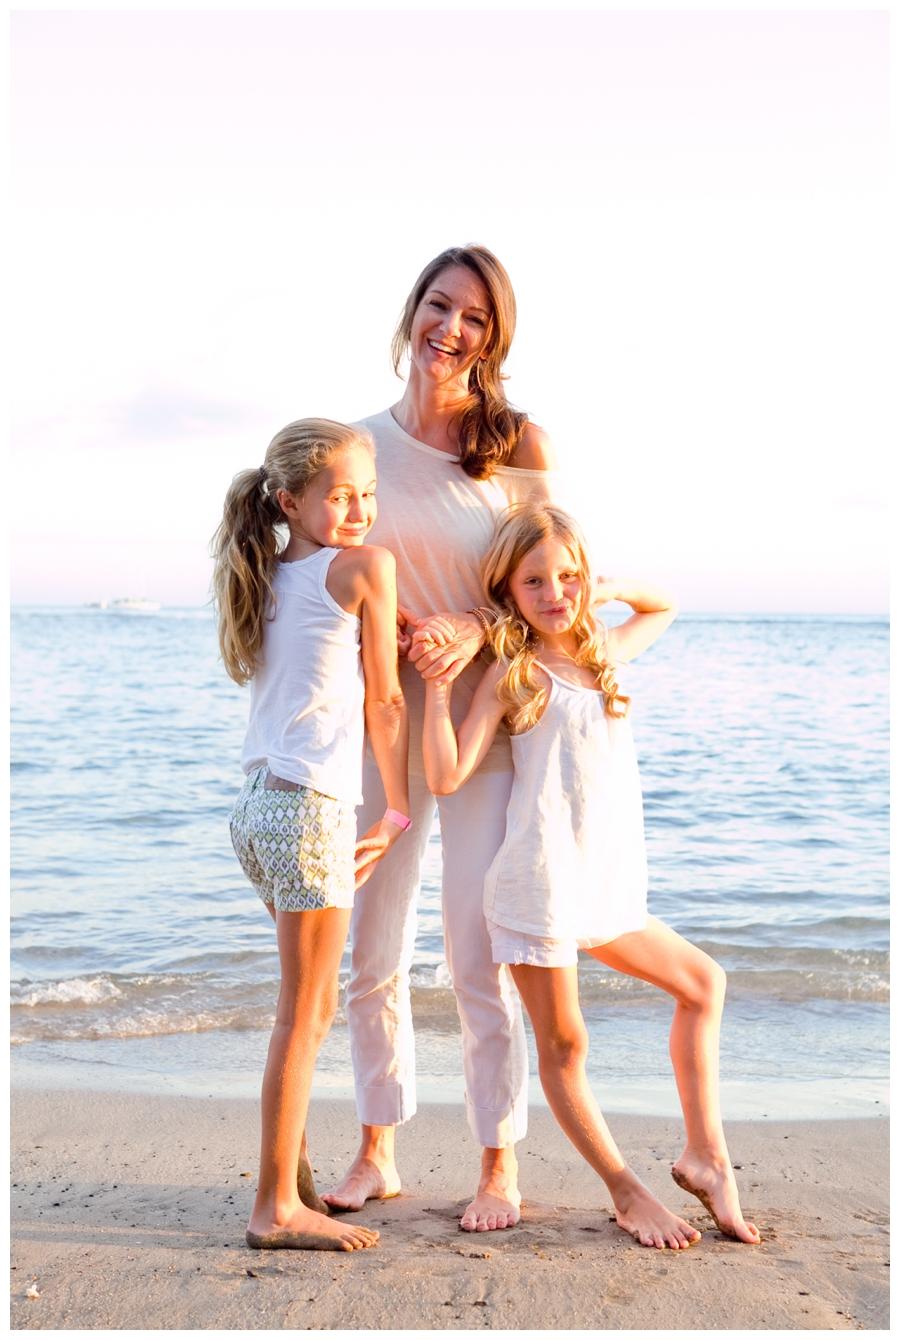 sandiegofamilyphotography-228.jpg